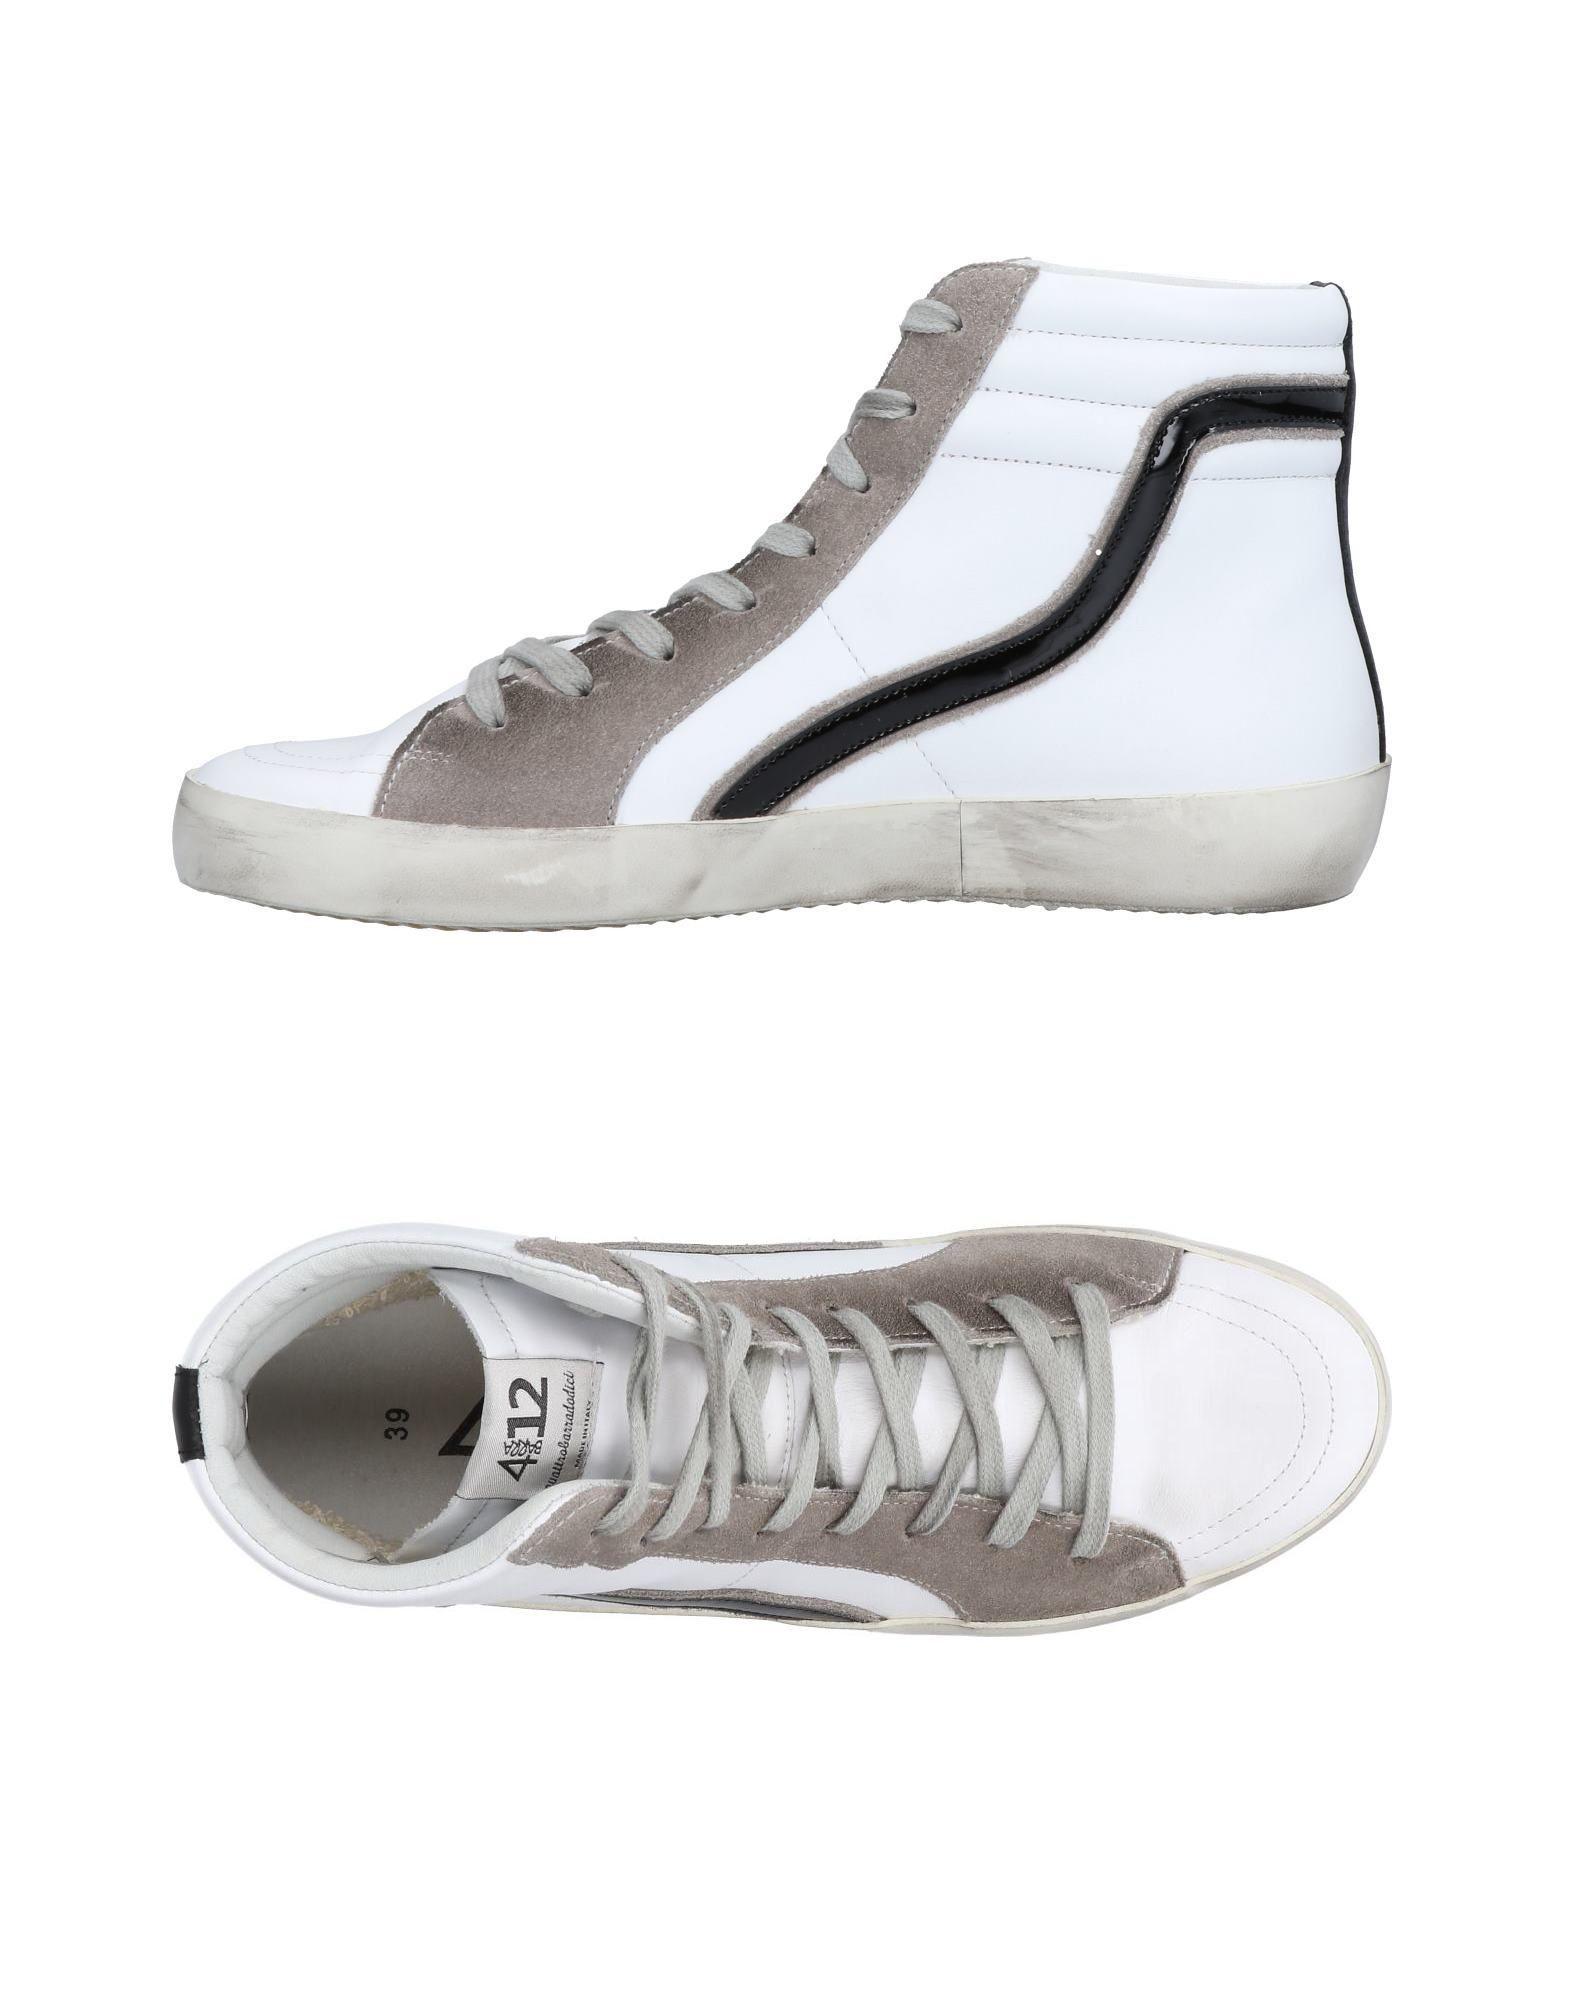 Quattrobarradodici Gute Sneakers Damen  11474145CW Gute Quattrobarradodici Qualität beliebte Schuhe 8ca13d